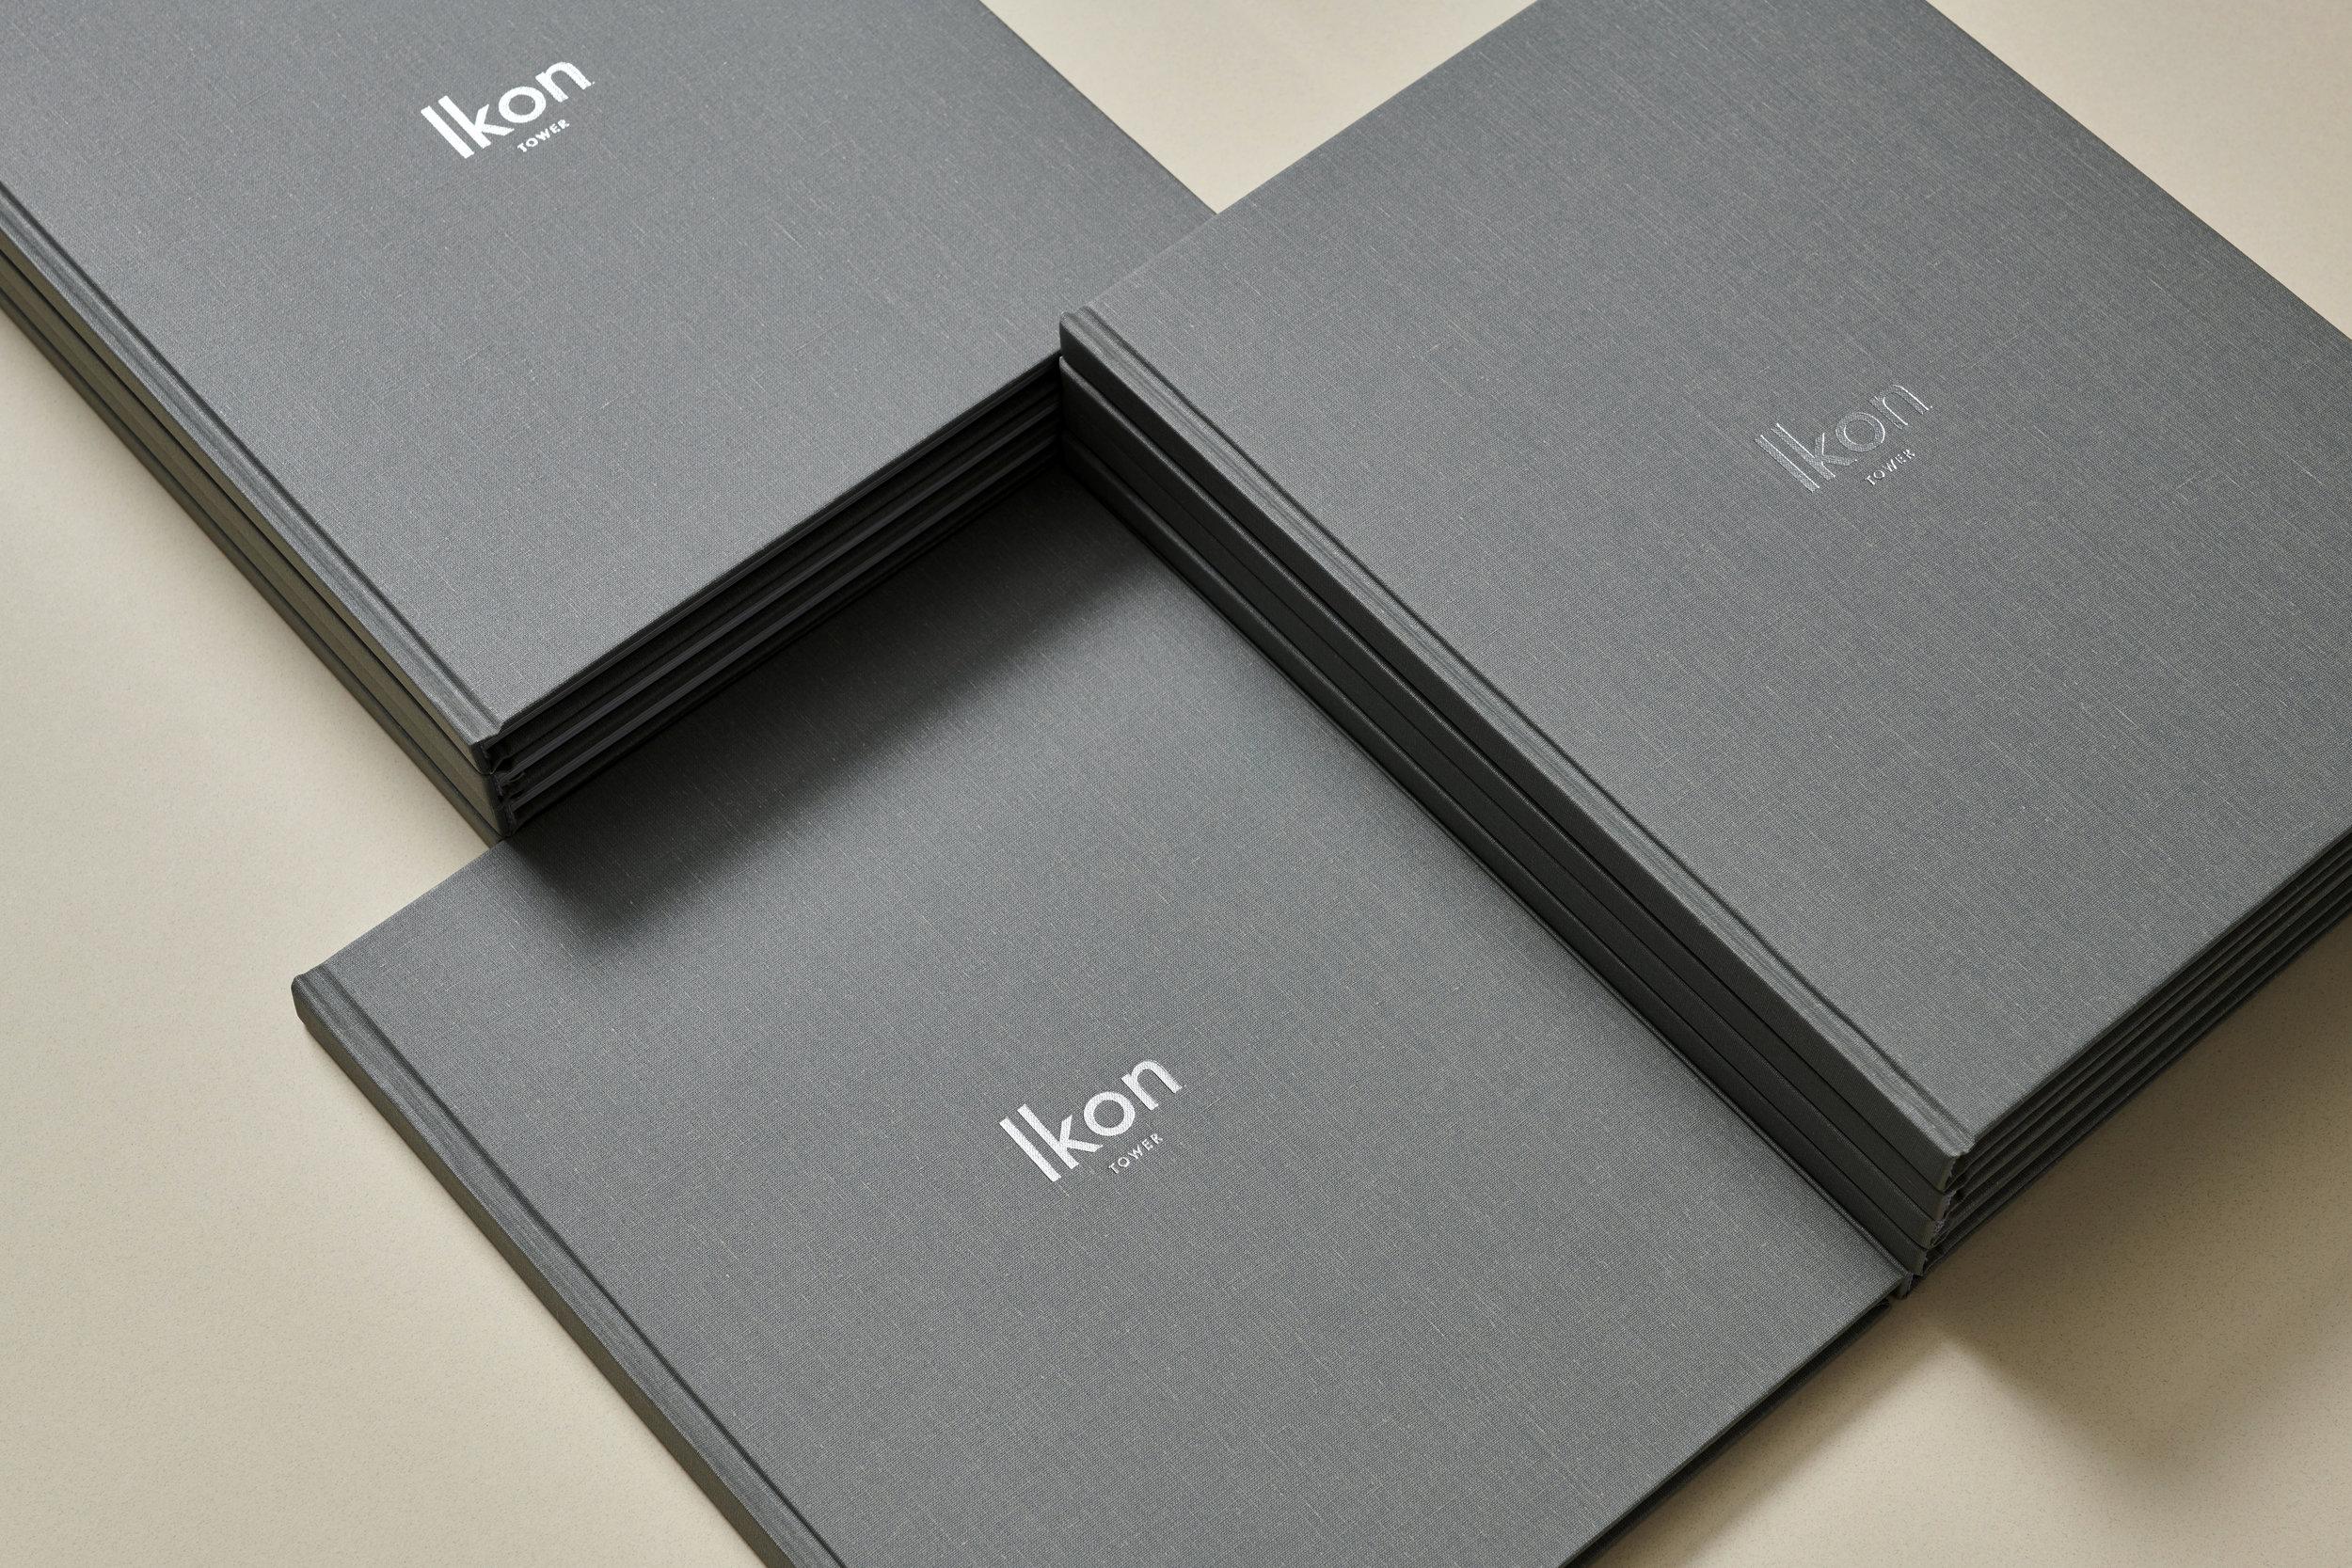 LAT_Ikon_Book_Covers.jpg